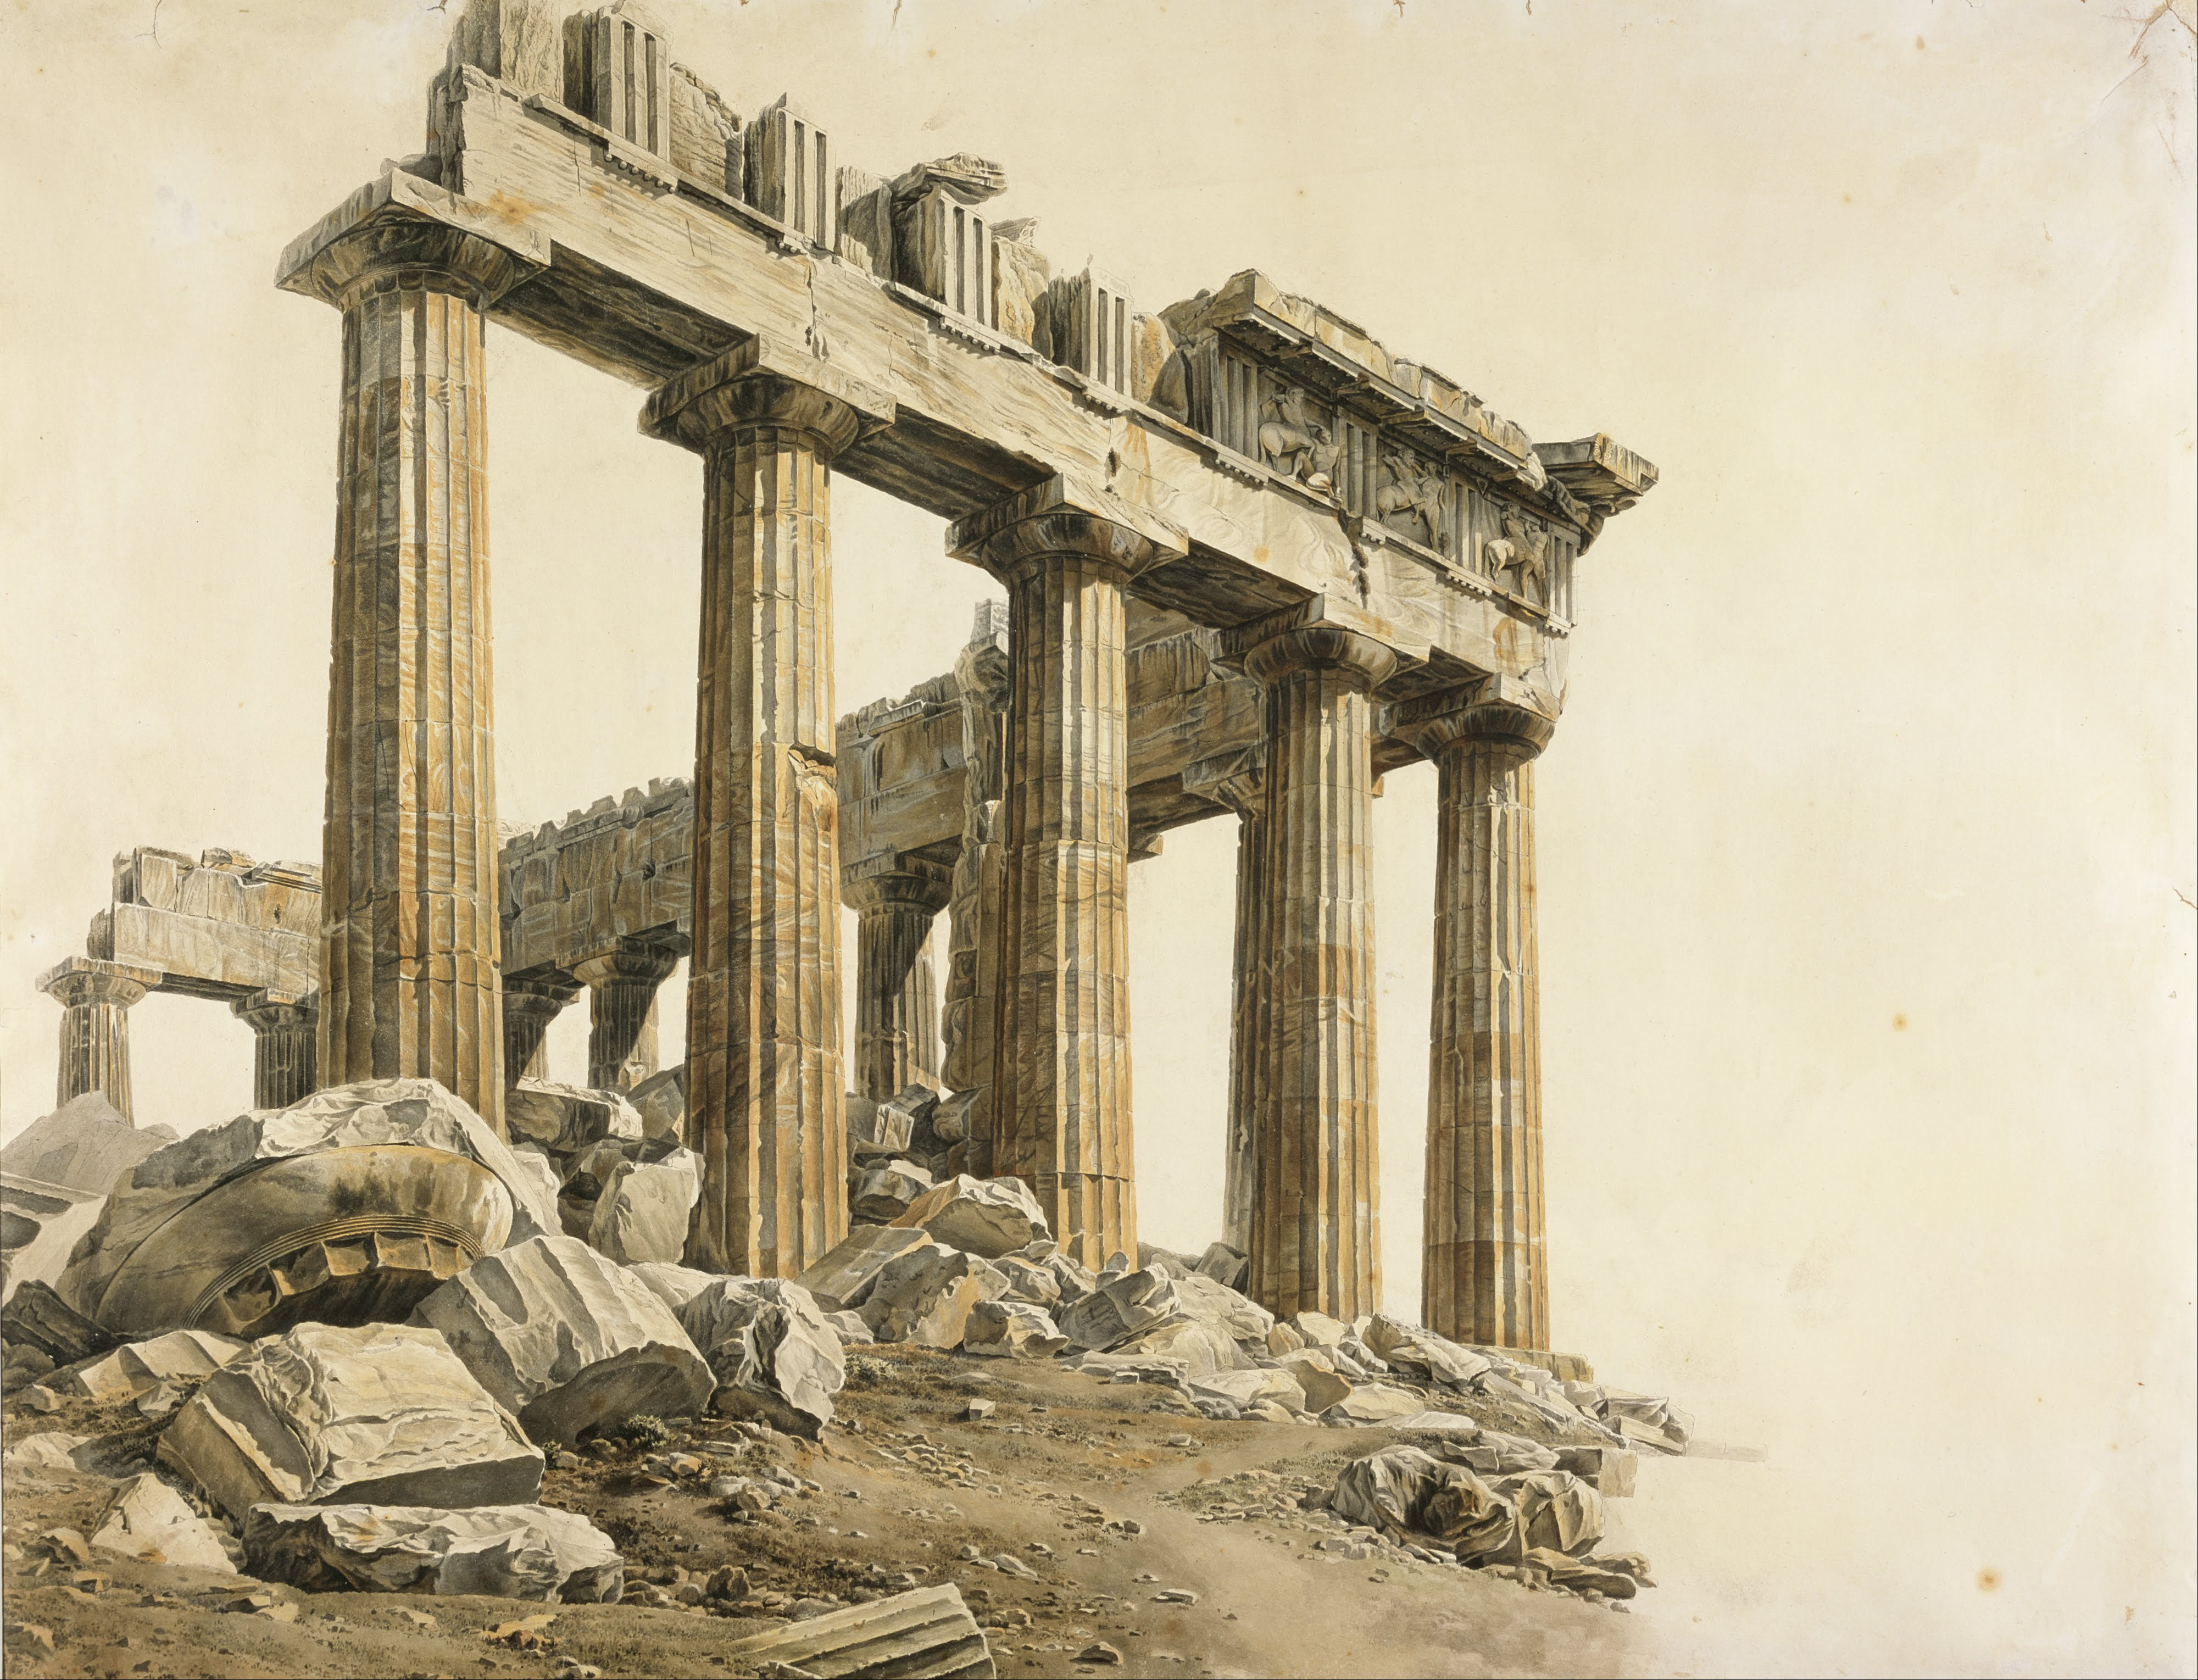 Esquina Sudeste del Partenón. Acuarela sobre papel (Lusieri, 1803)